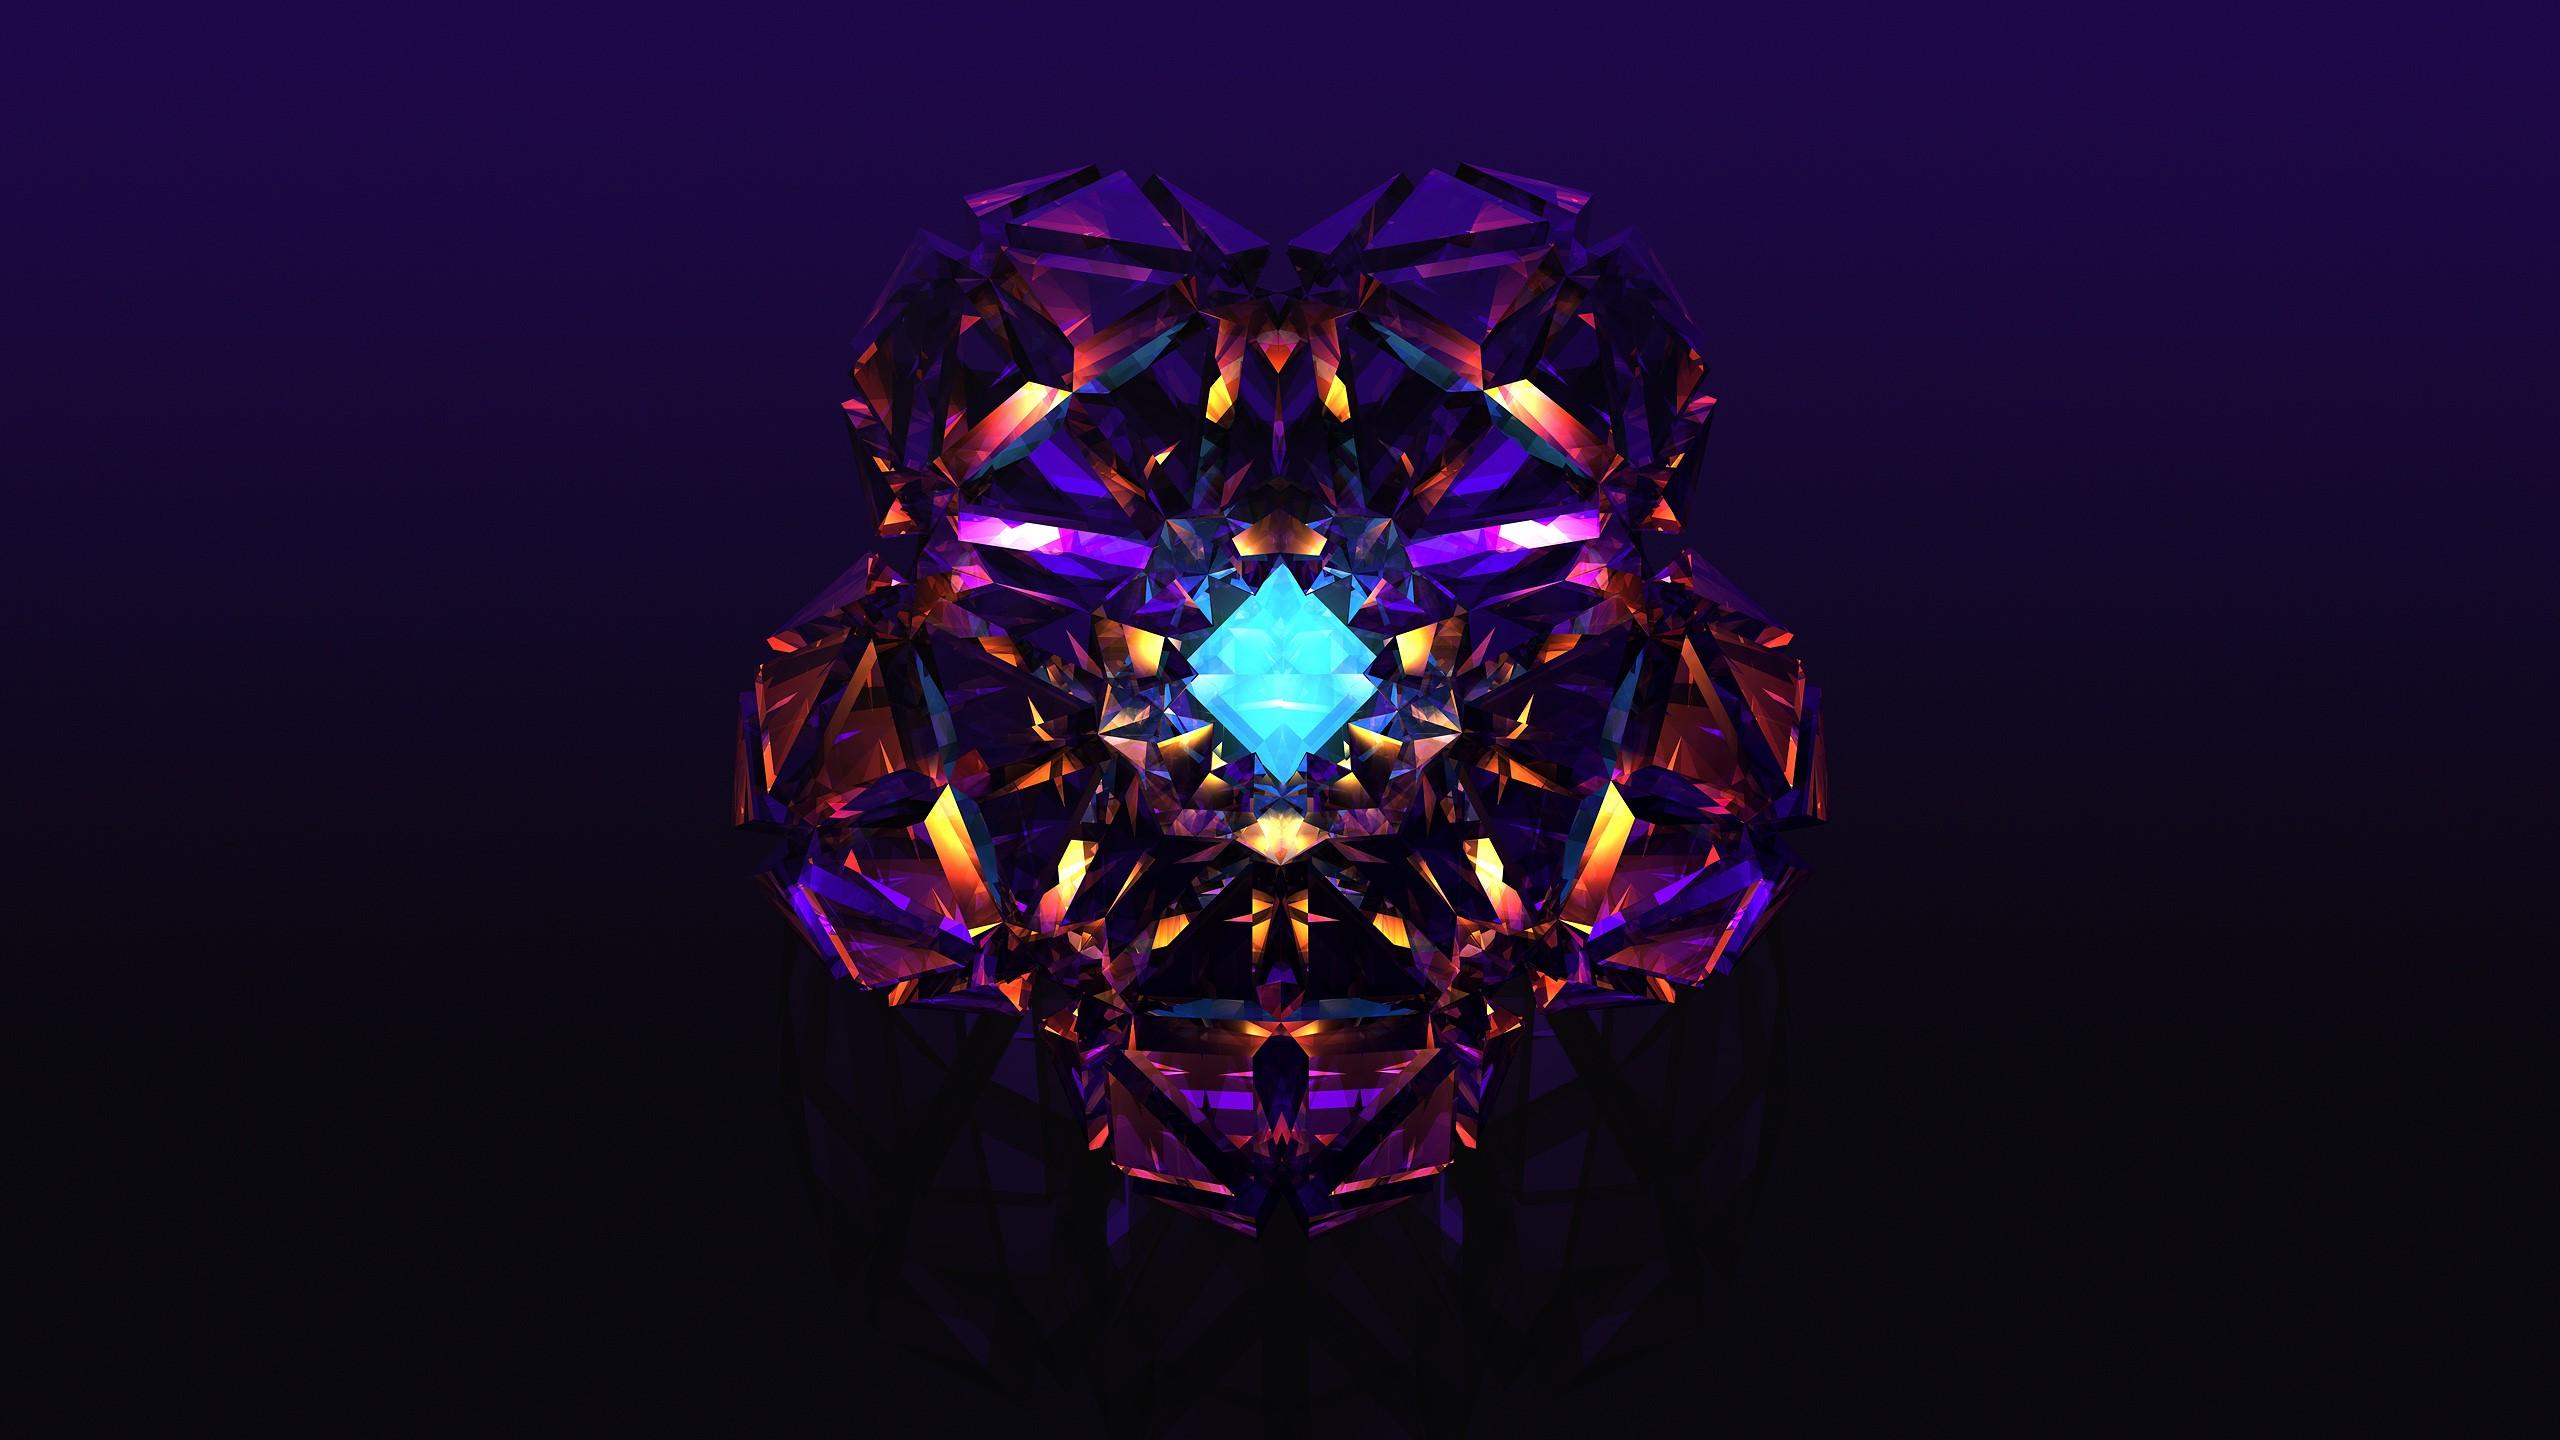 Sfondi : arte digitale astratto viola sfera simmetria blu